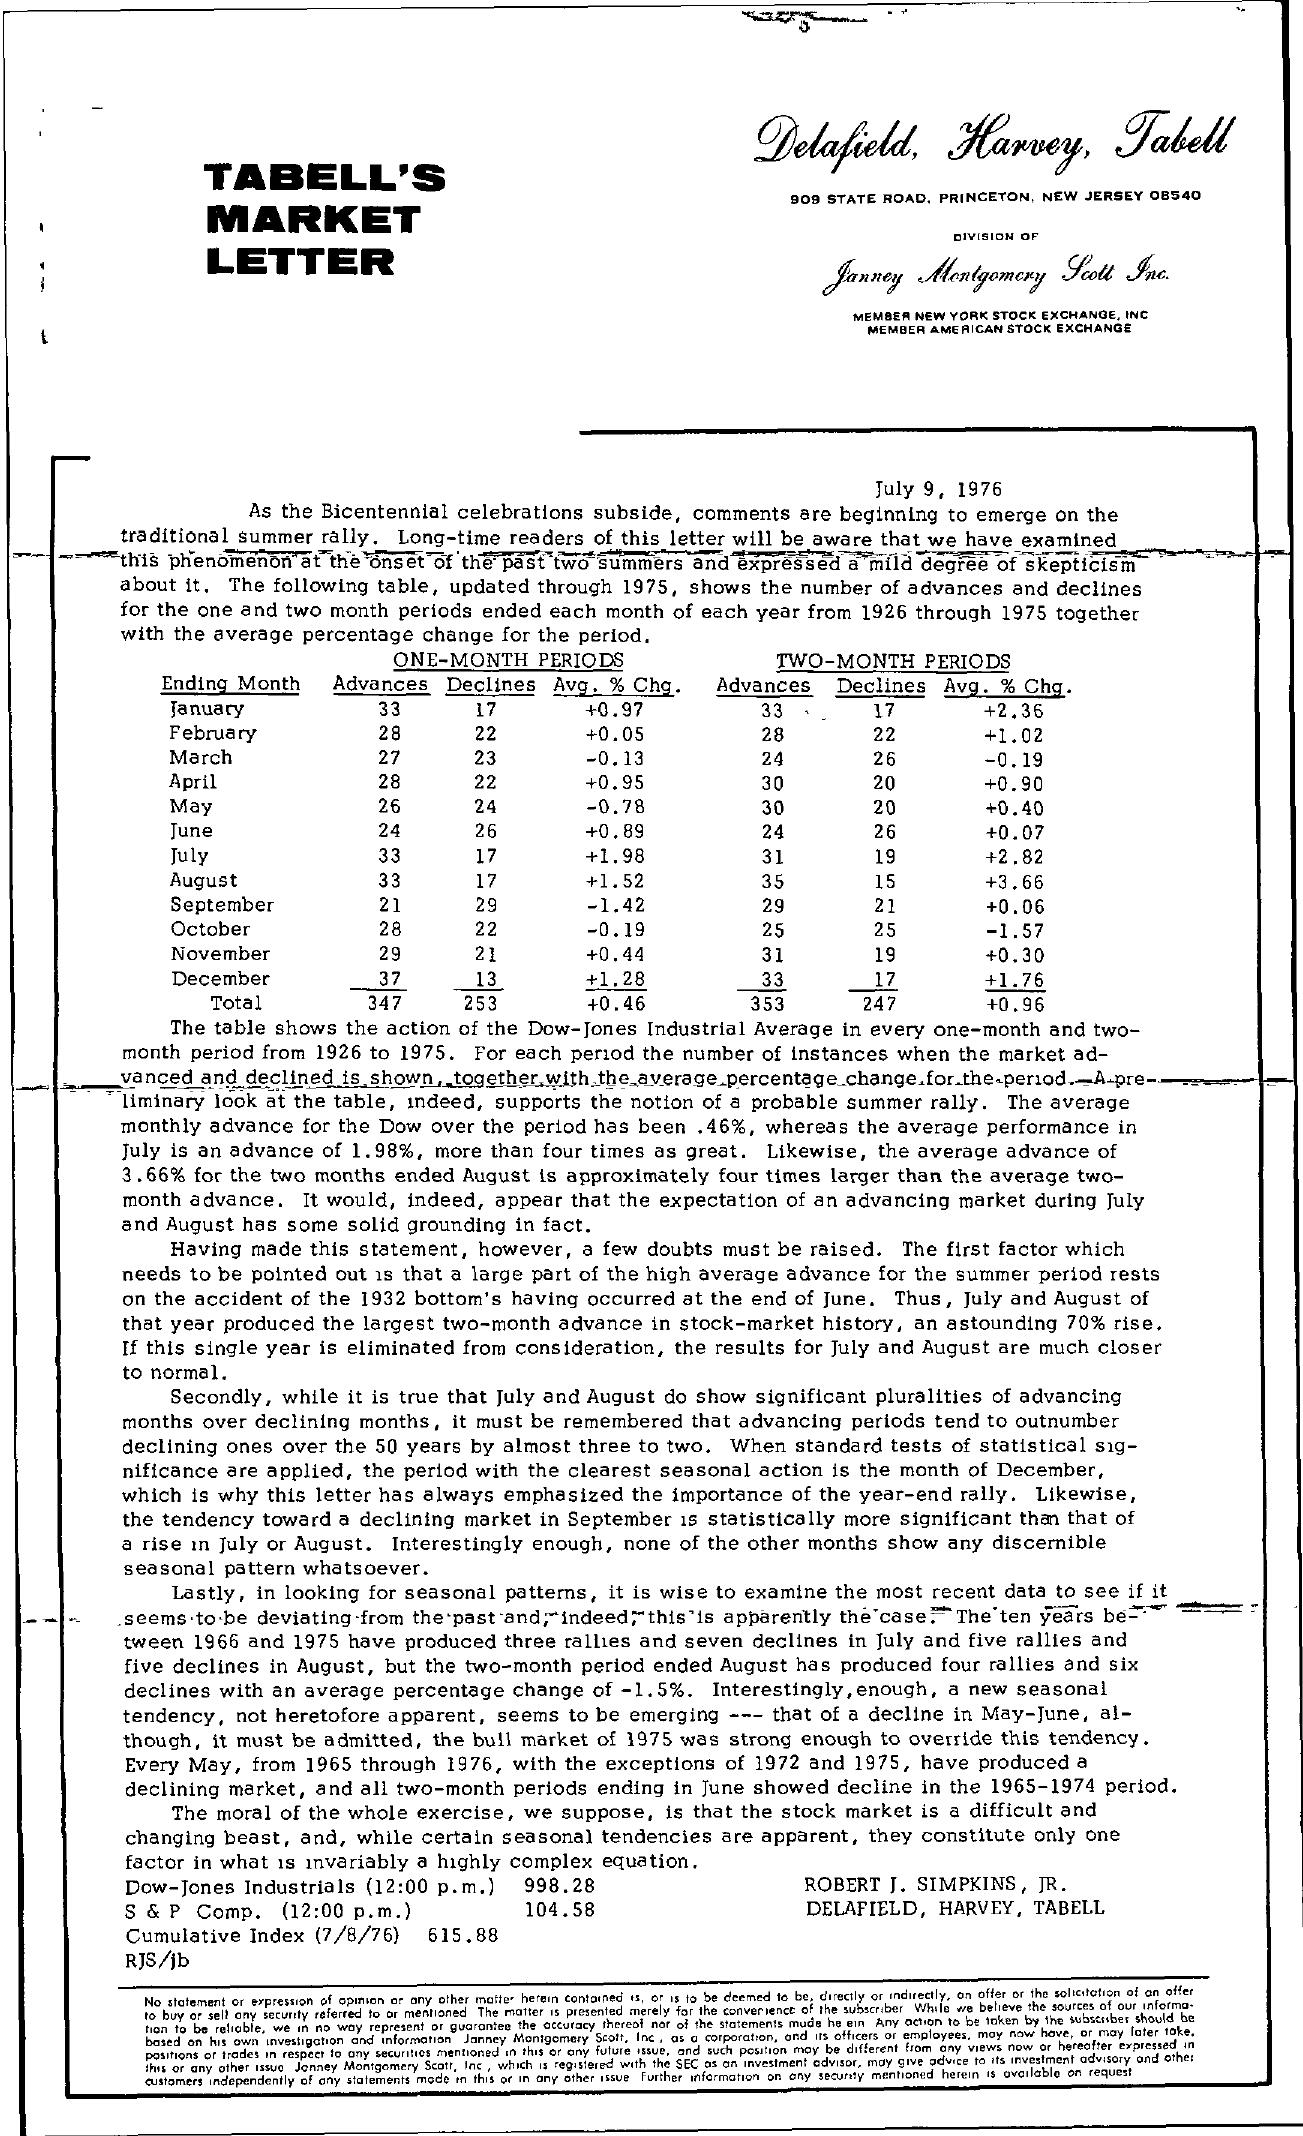 Tabell's Market Letter - July 09, 1976